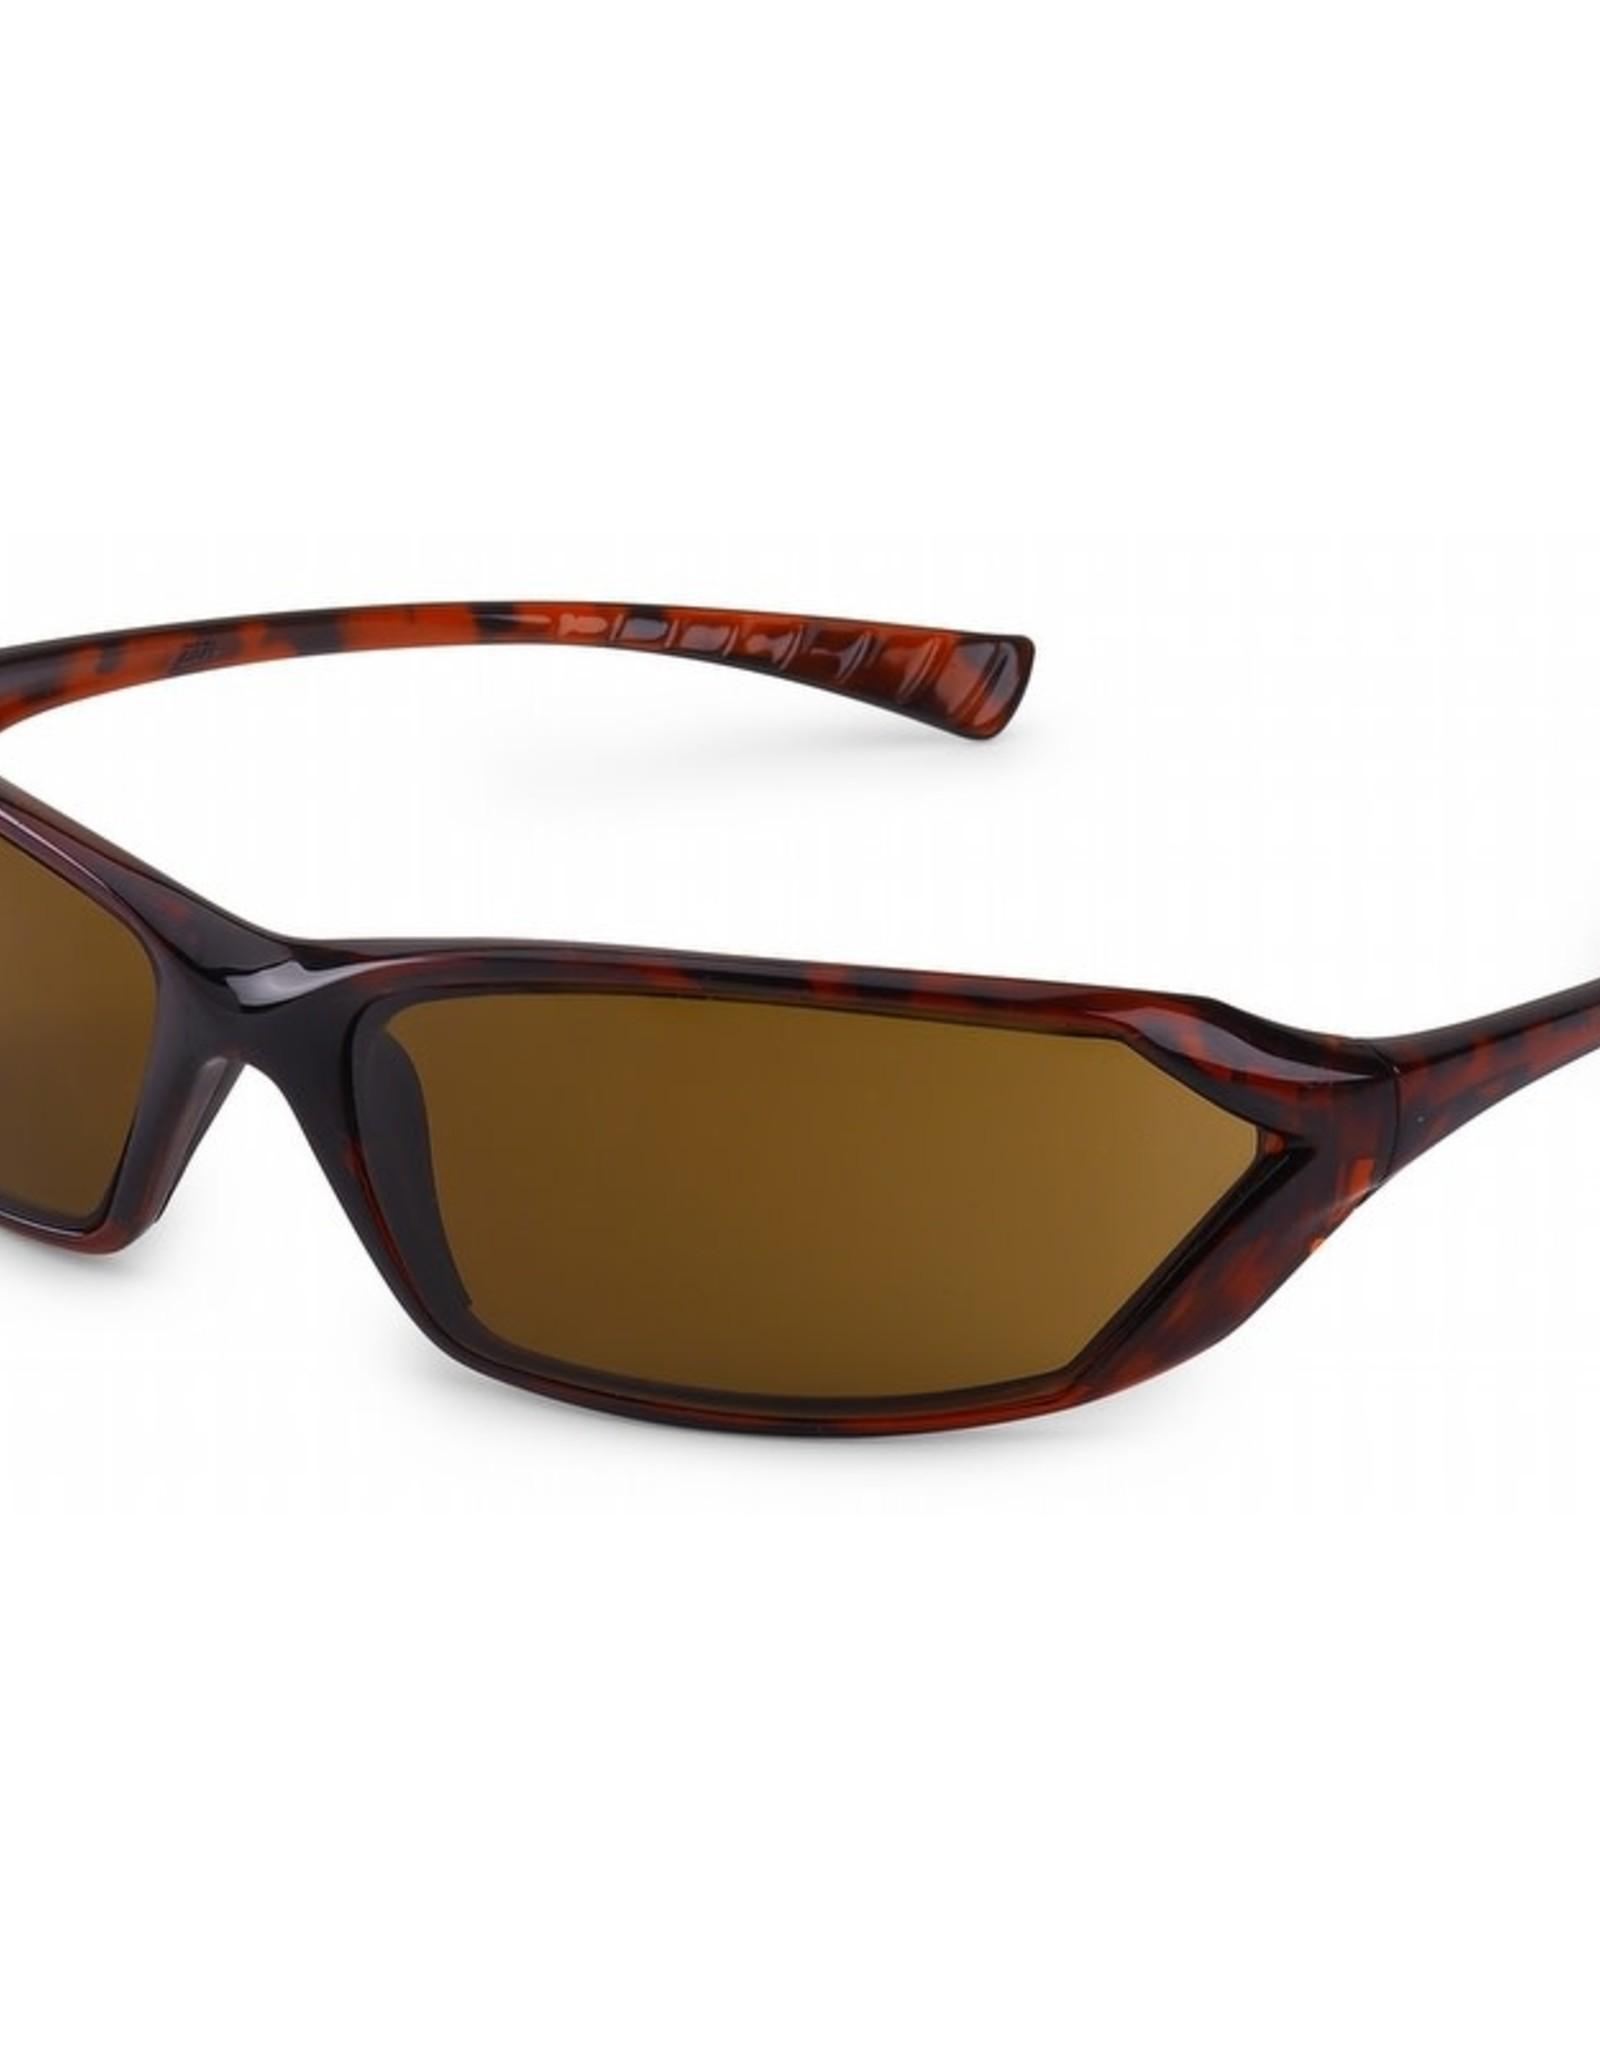 Gateway Metro Safety Glasses - Tortoise Shell Frame with Mocha Lens, 23TS86